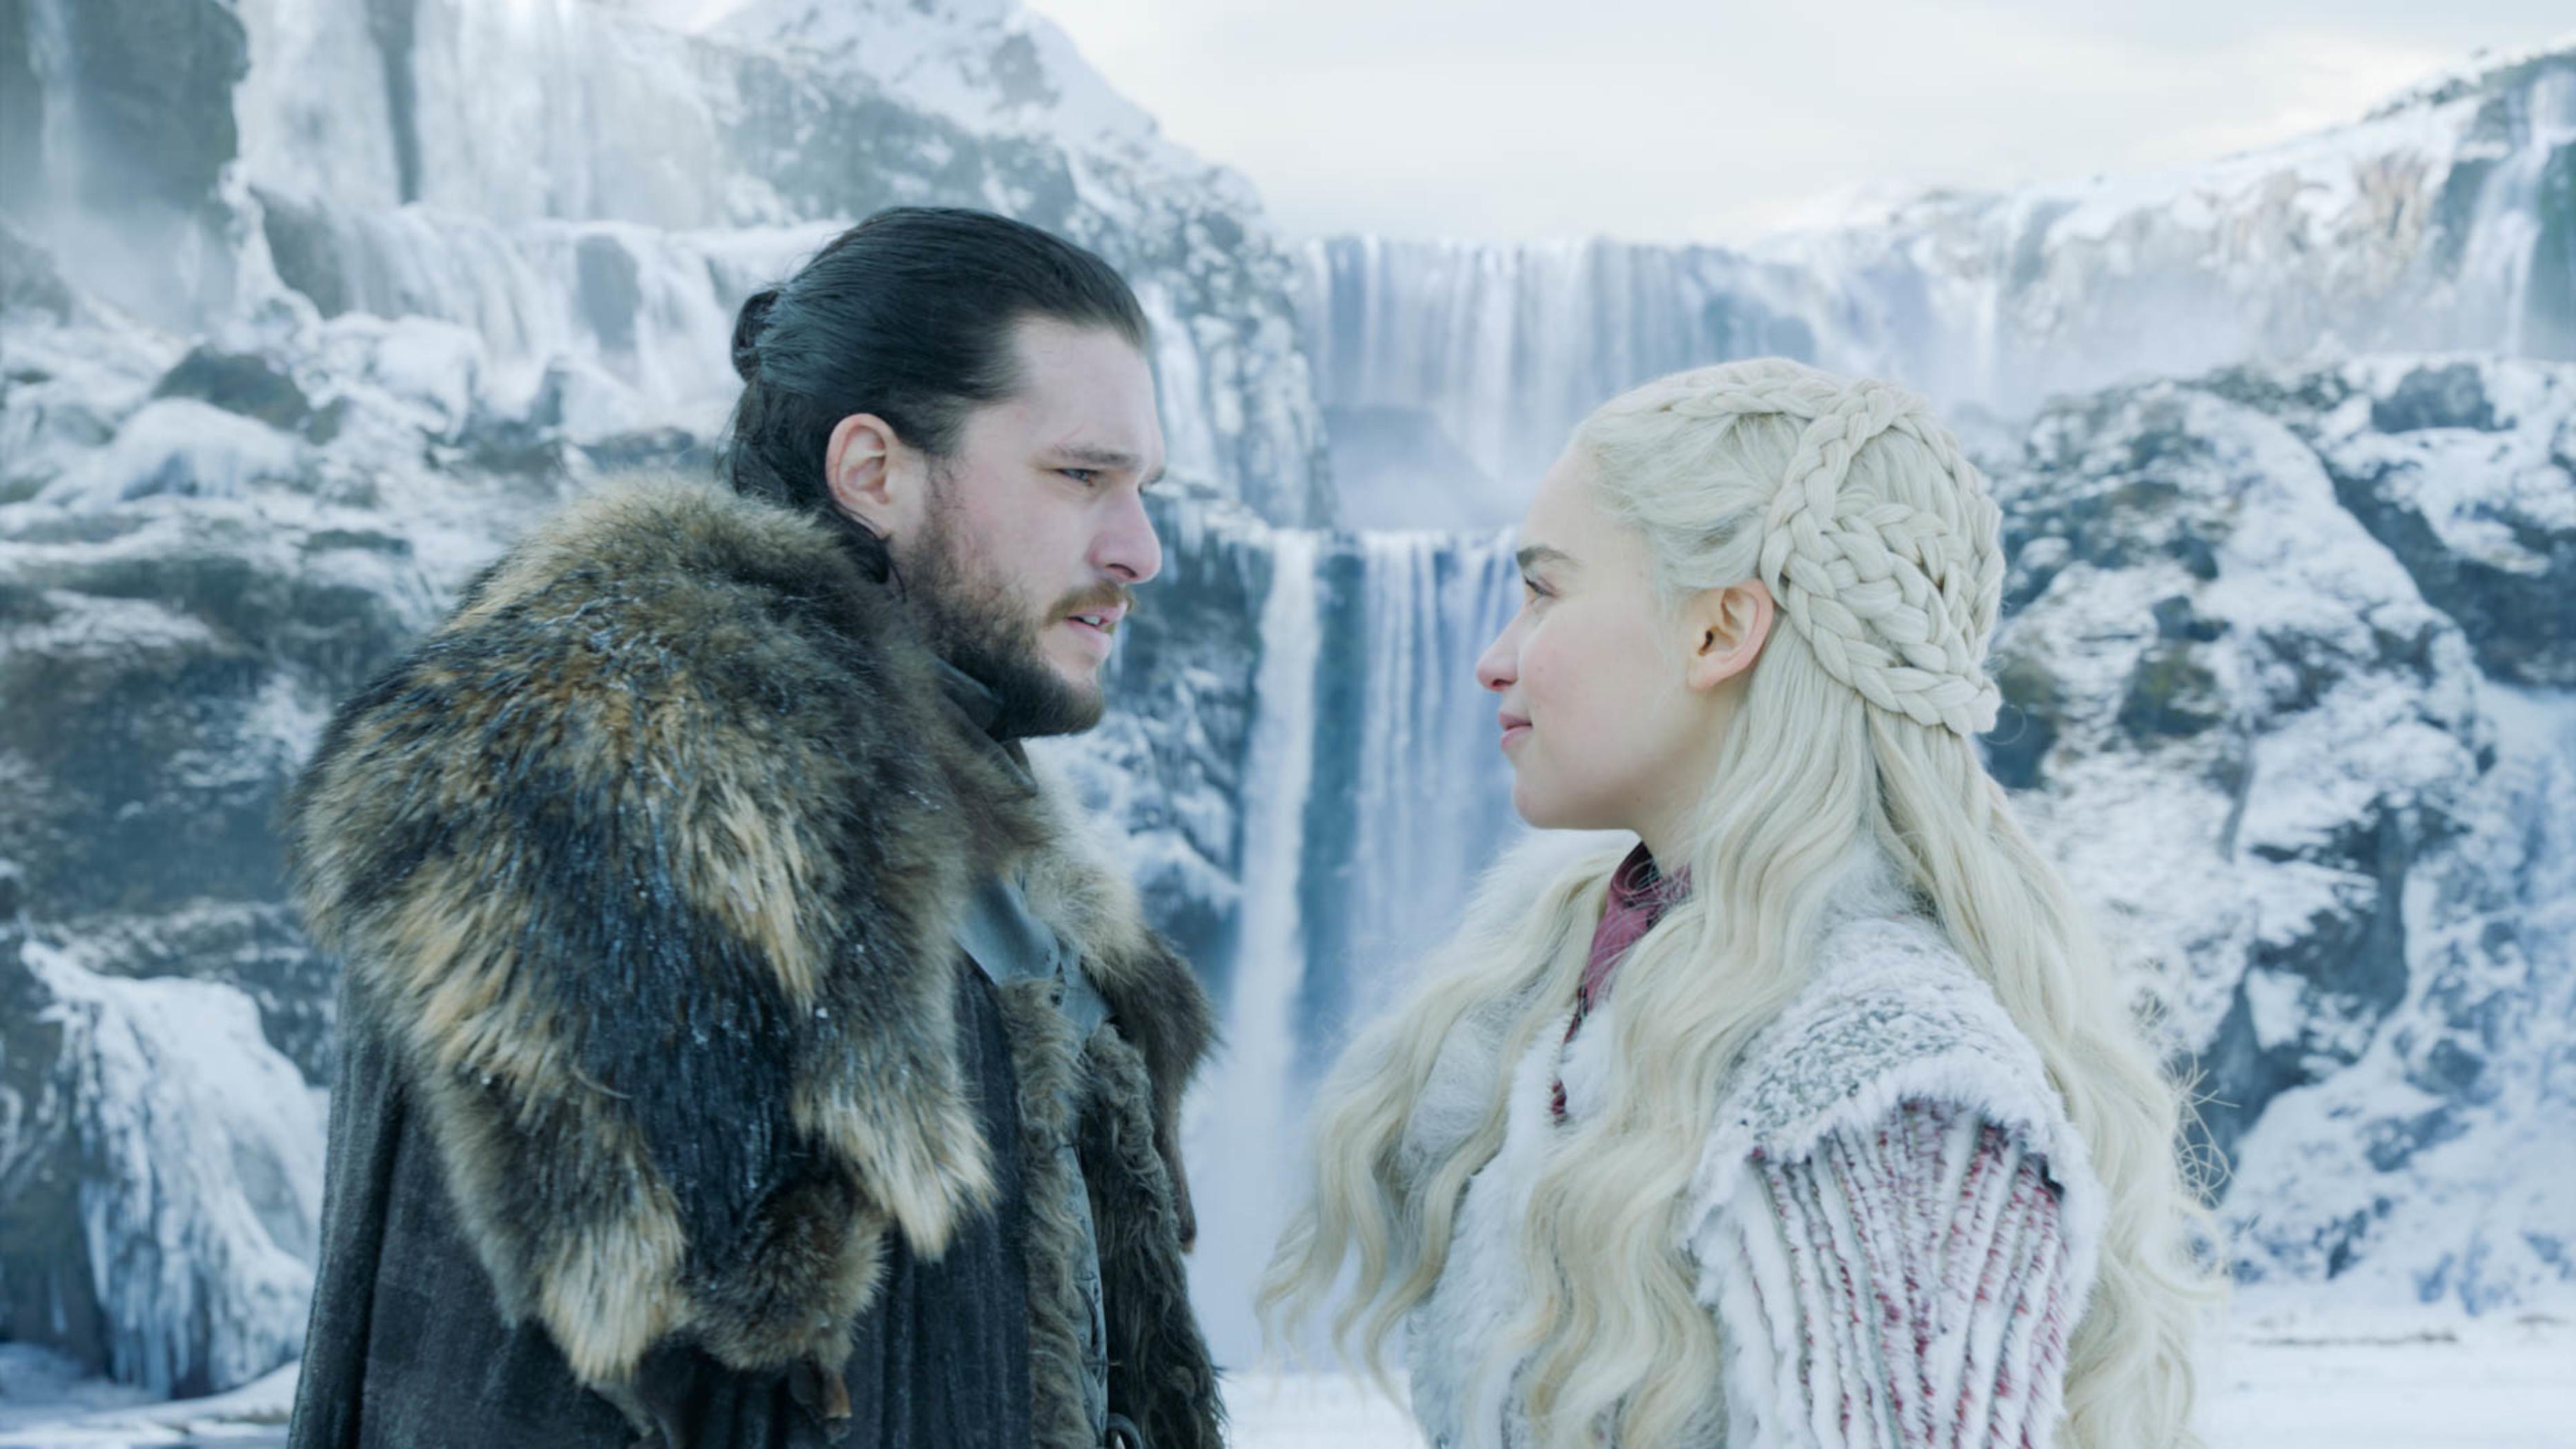 Game of Thrones: Jon Snow Daenerys Targaryan Romance Is a Problem